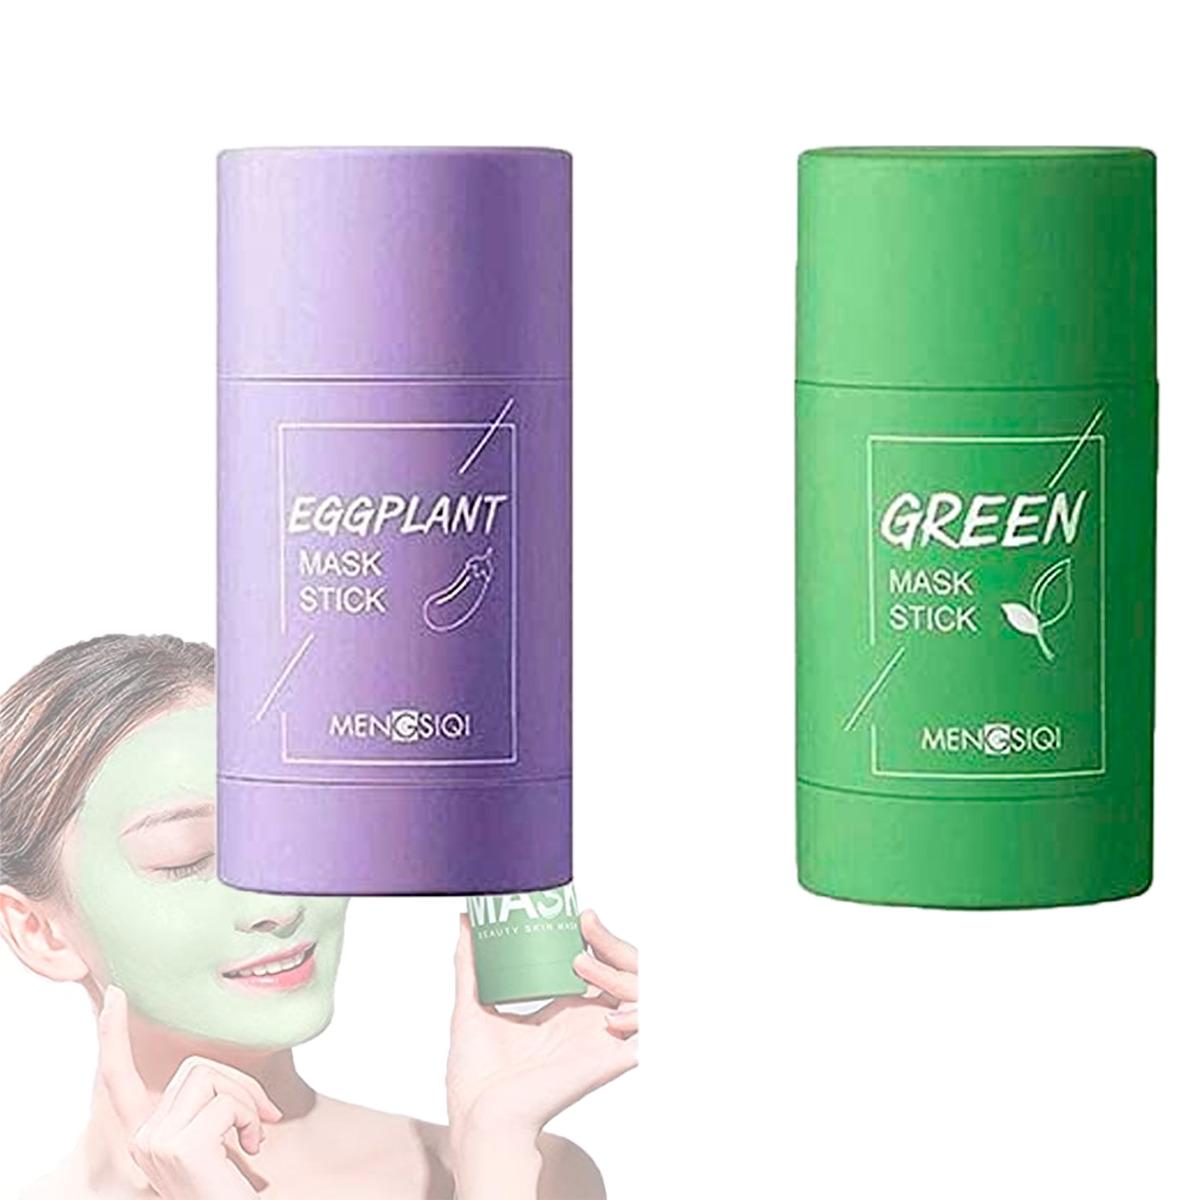 Berenjena Té Verde Máscara Limpiadora Stick Anti-acné 1 Pz